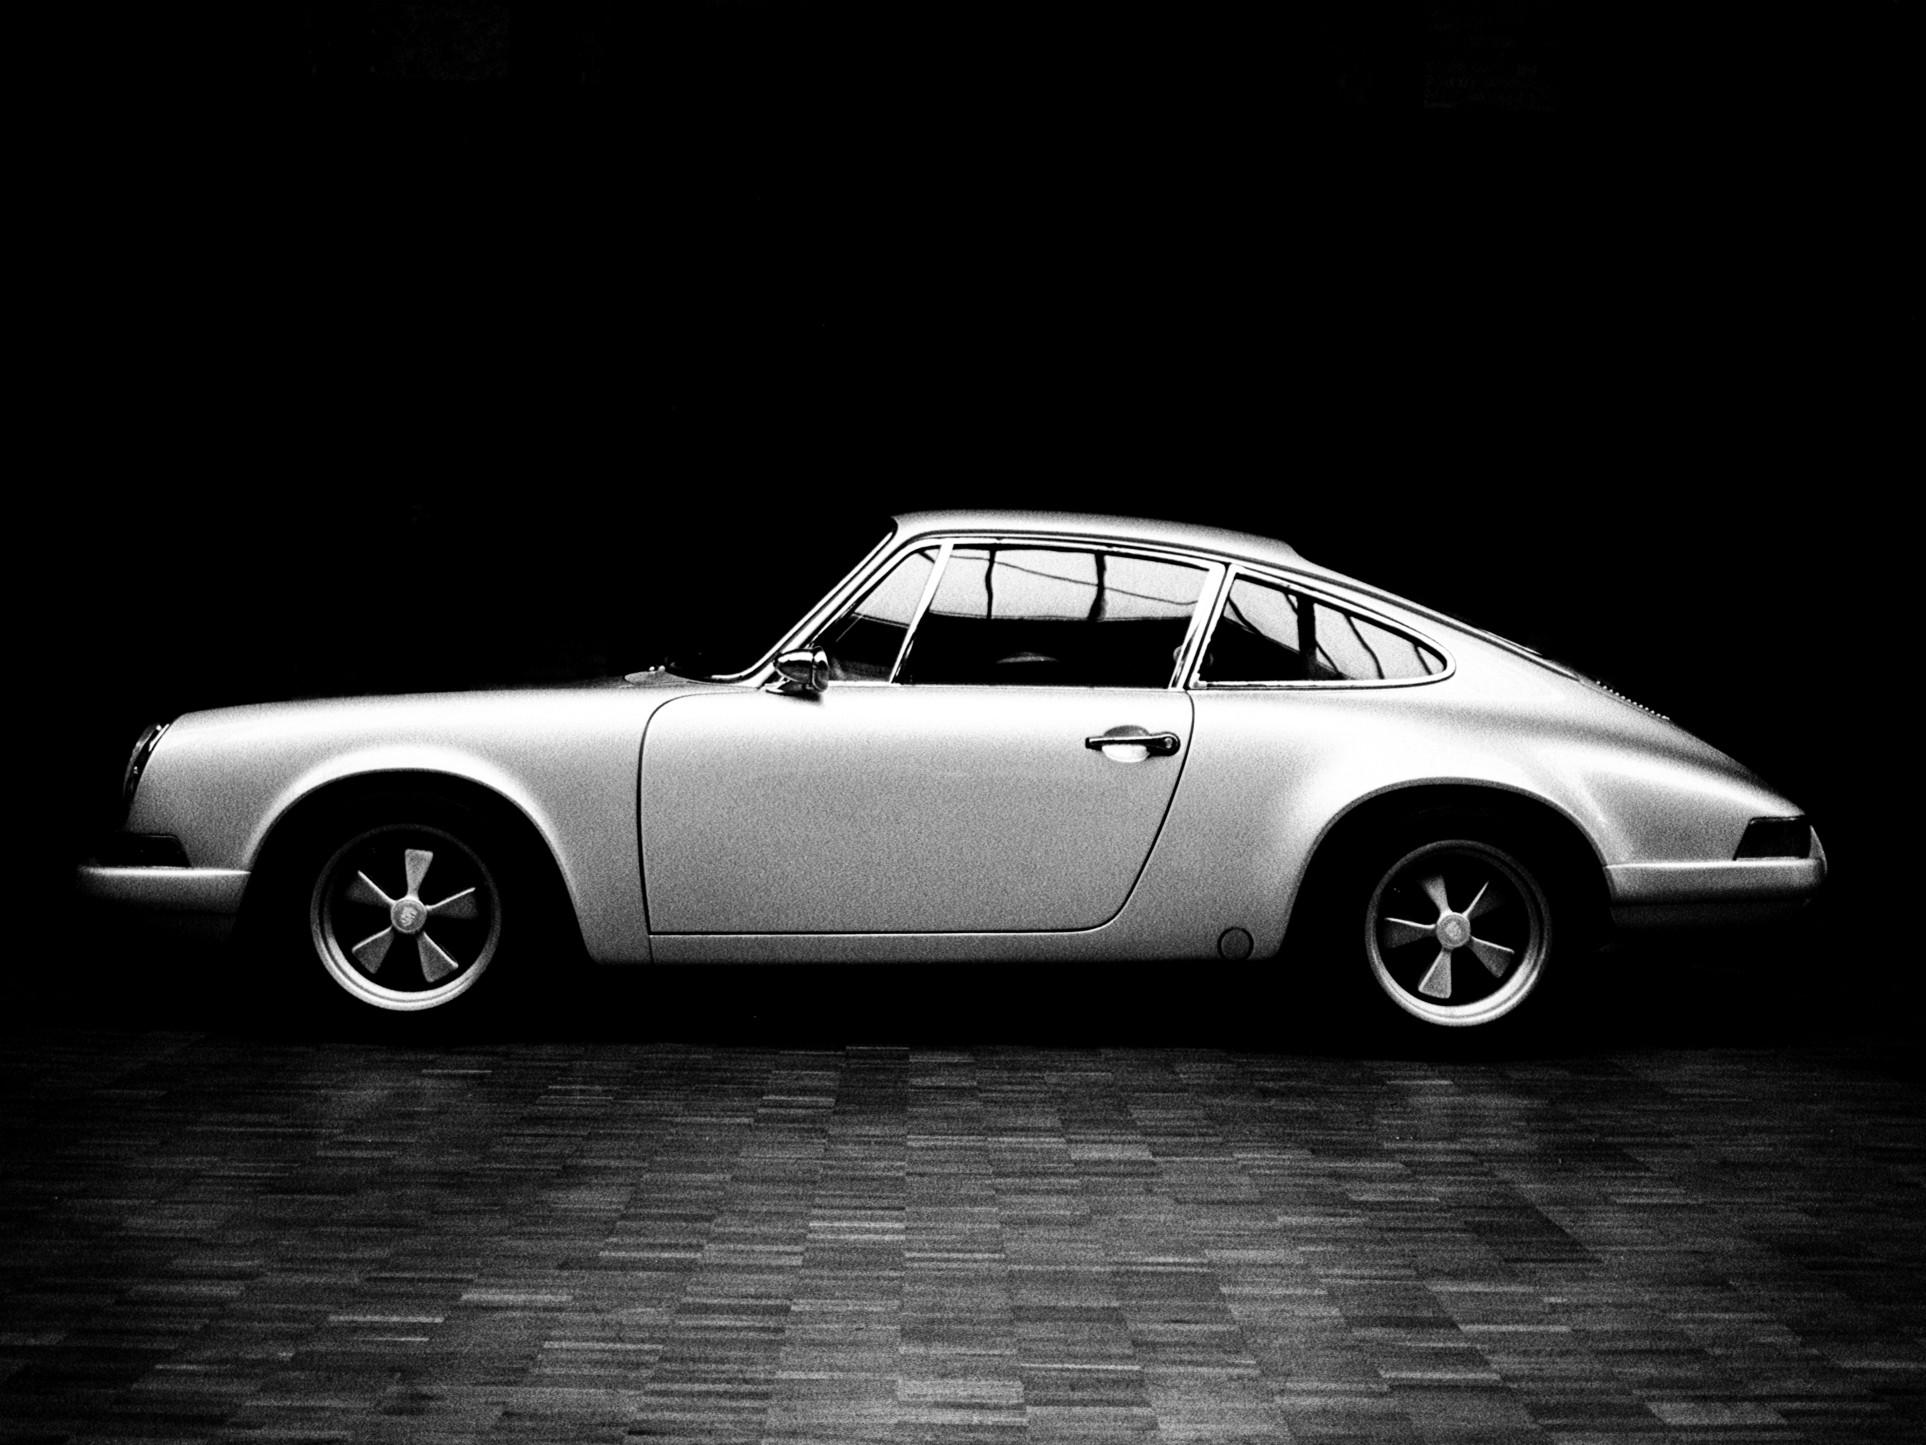 Porsches by Bart Kuykens